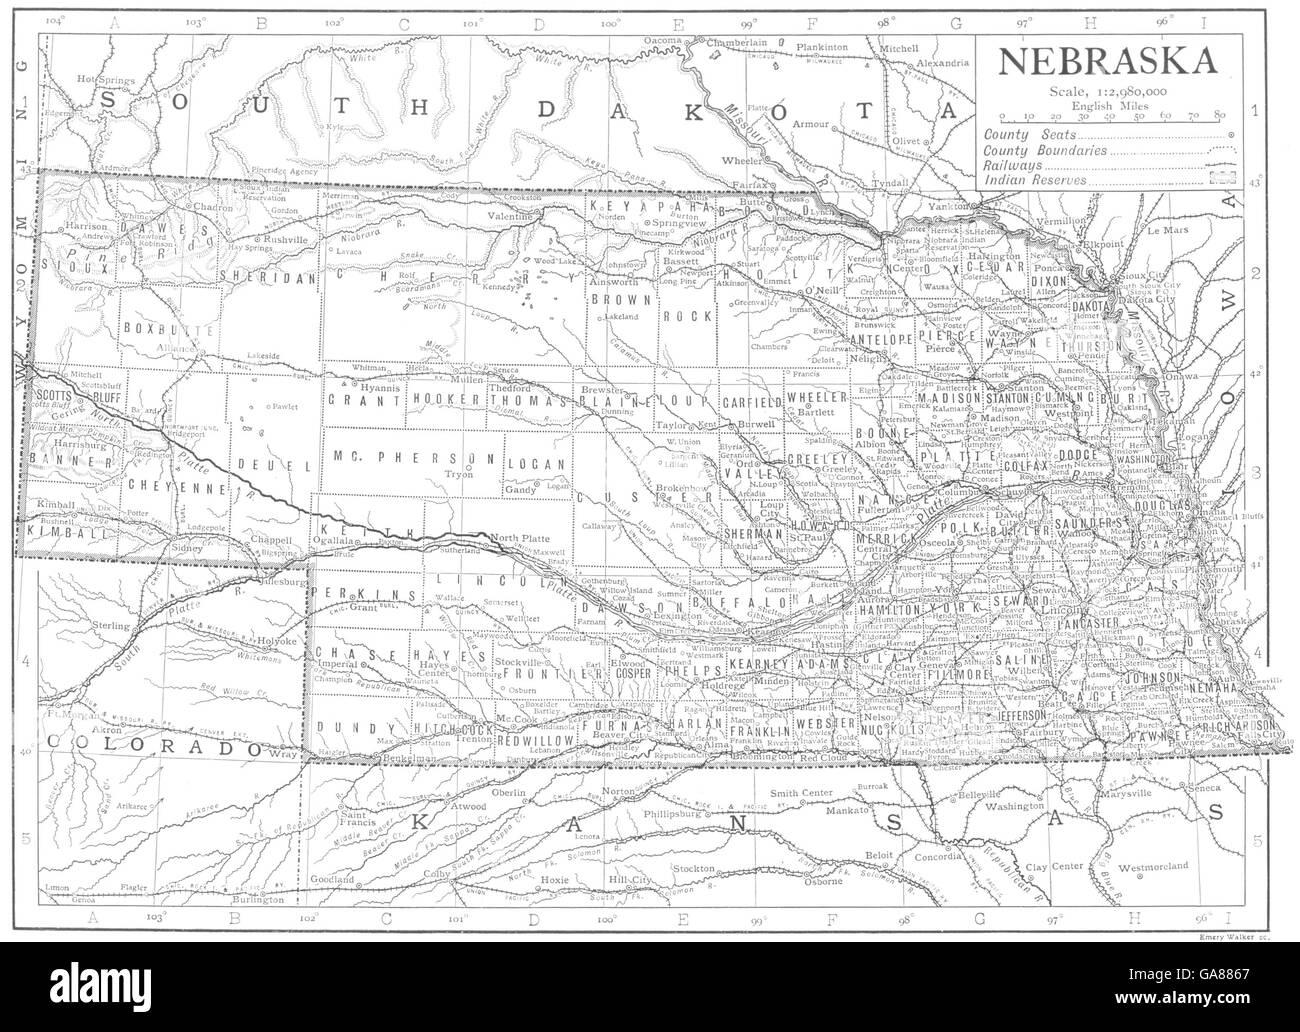 Nebraska Map Vintage Stock Photos Nebraska Map Vintage Stock